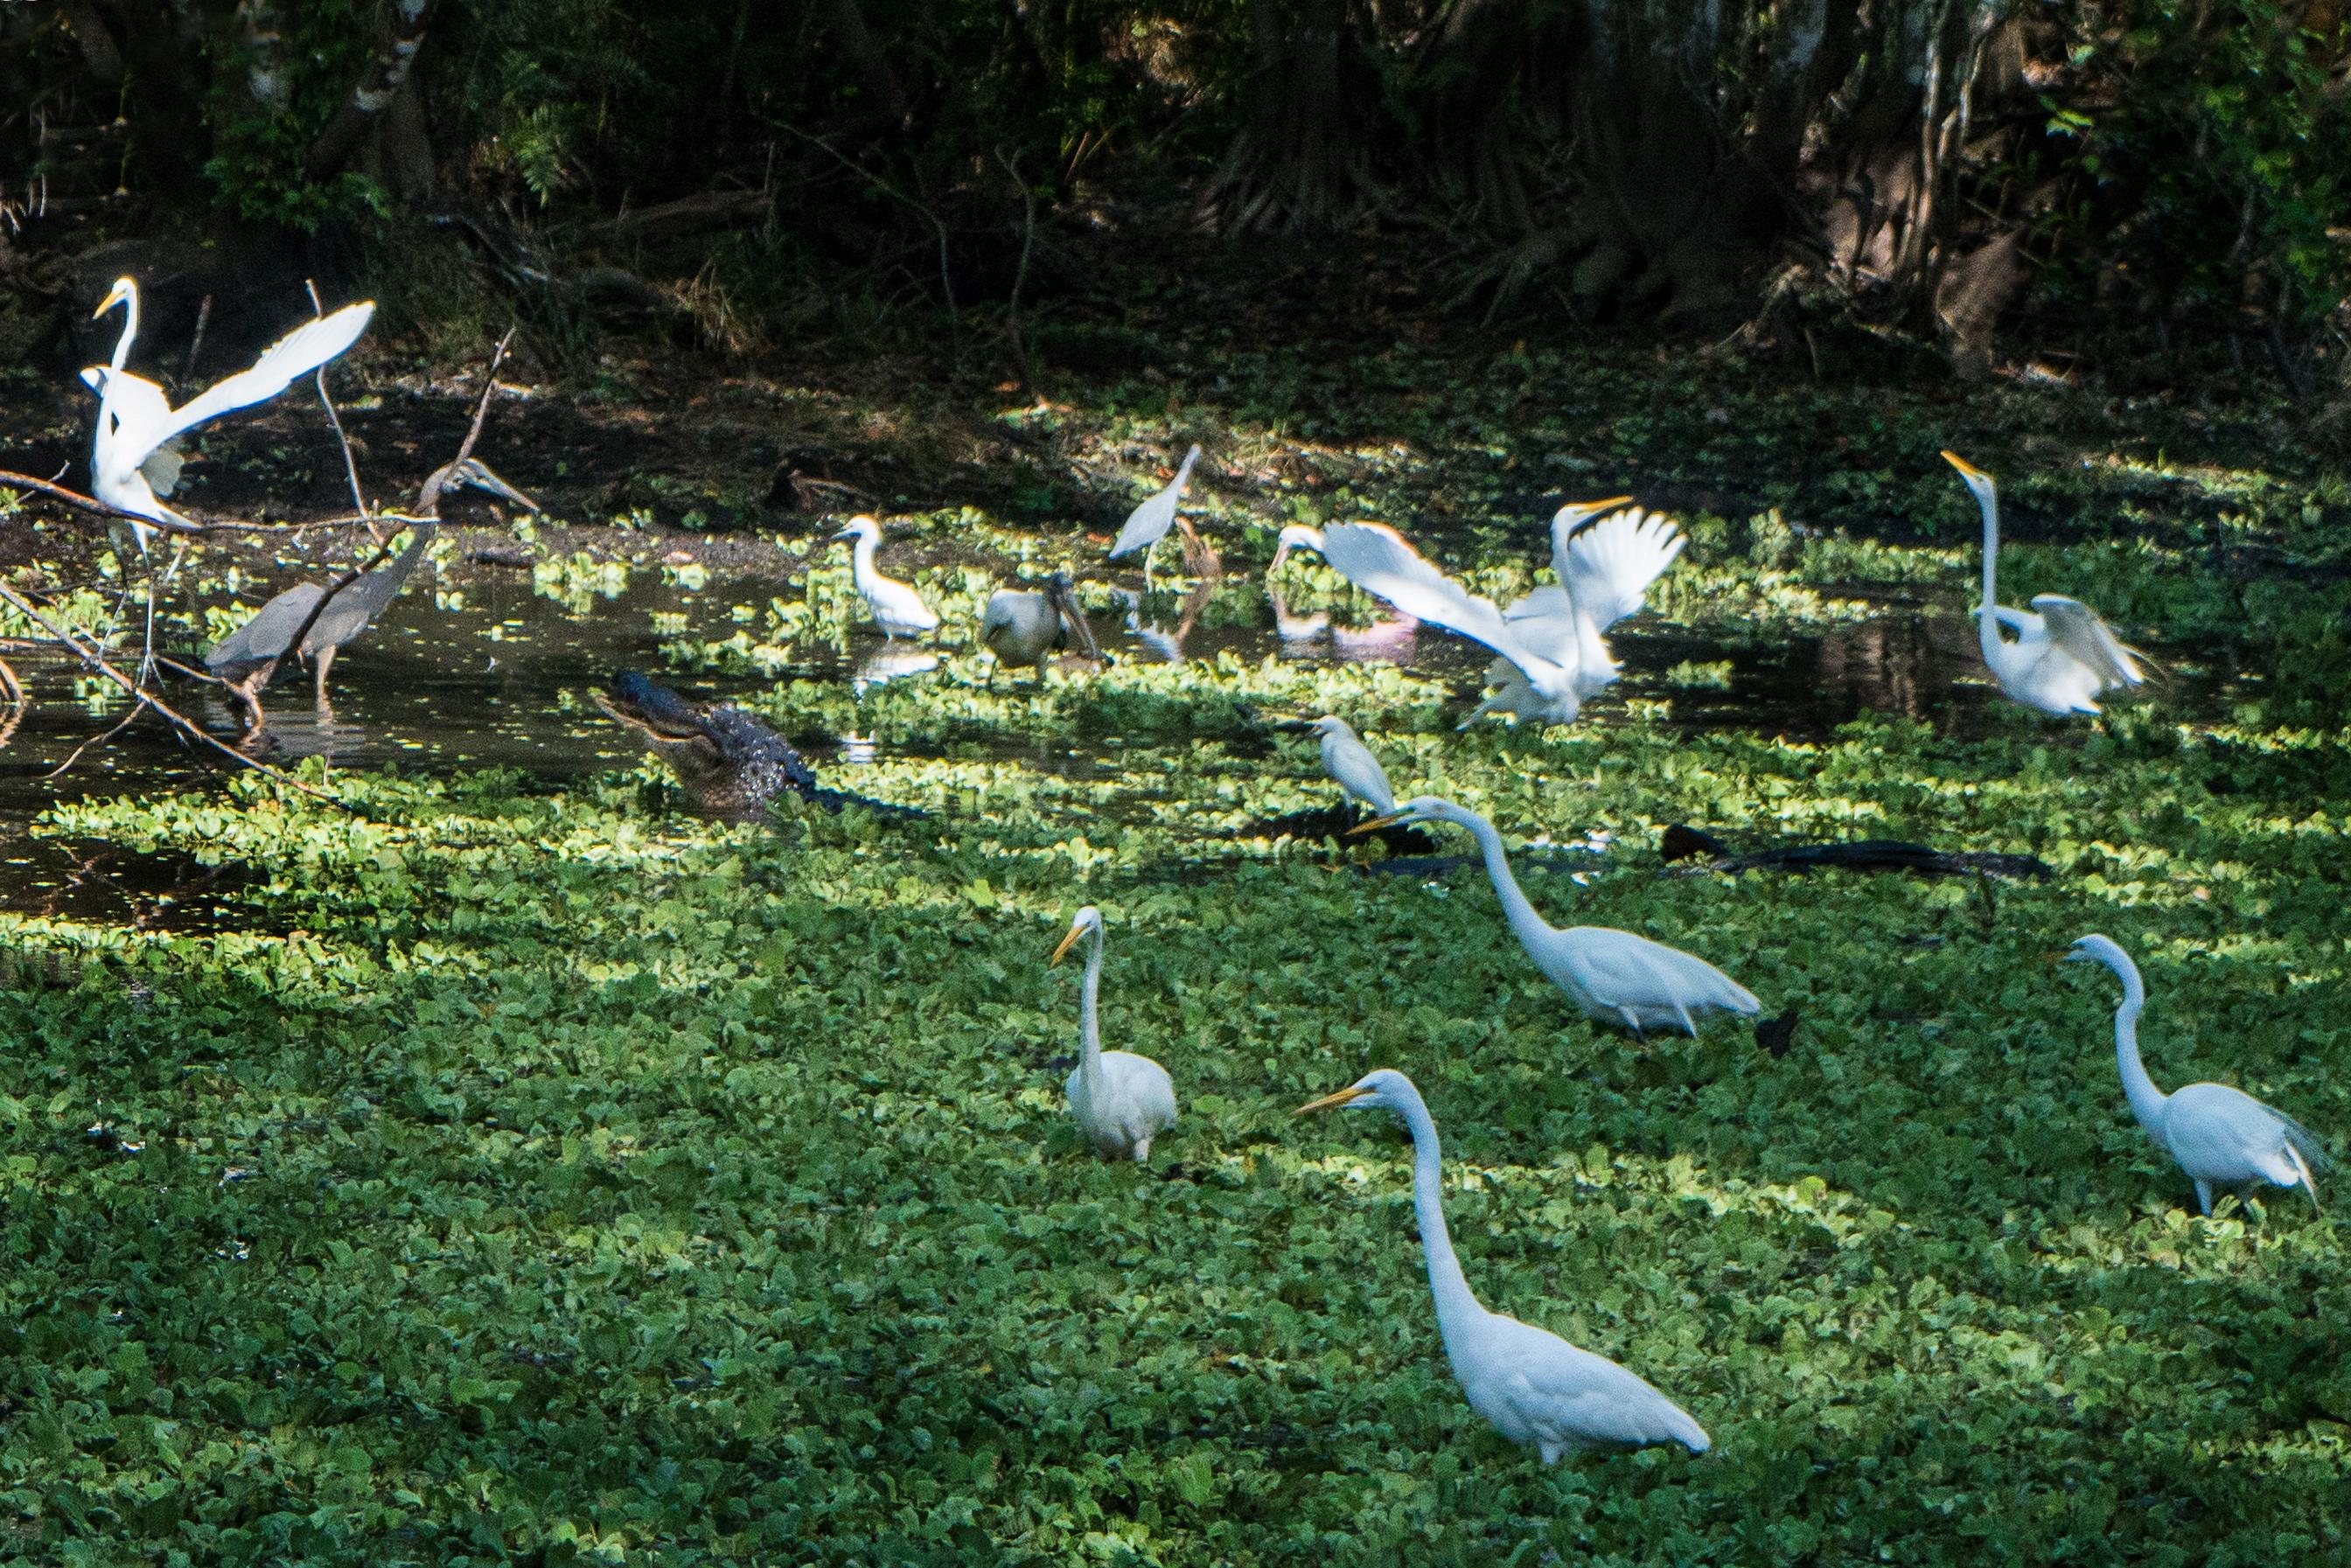 #blueheron, #alligator, #corkscrew, #egret, #lettucelakes, #florida, #drought, #wildlife, #nature